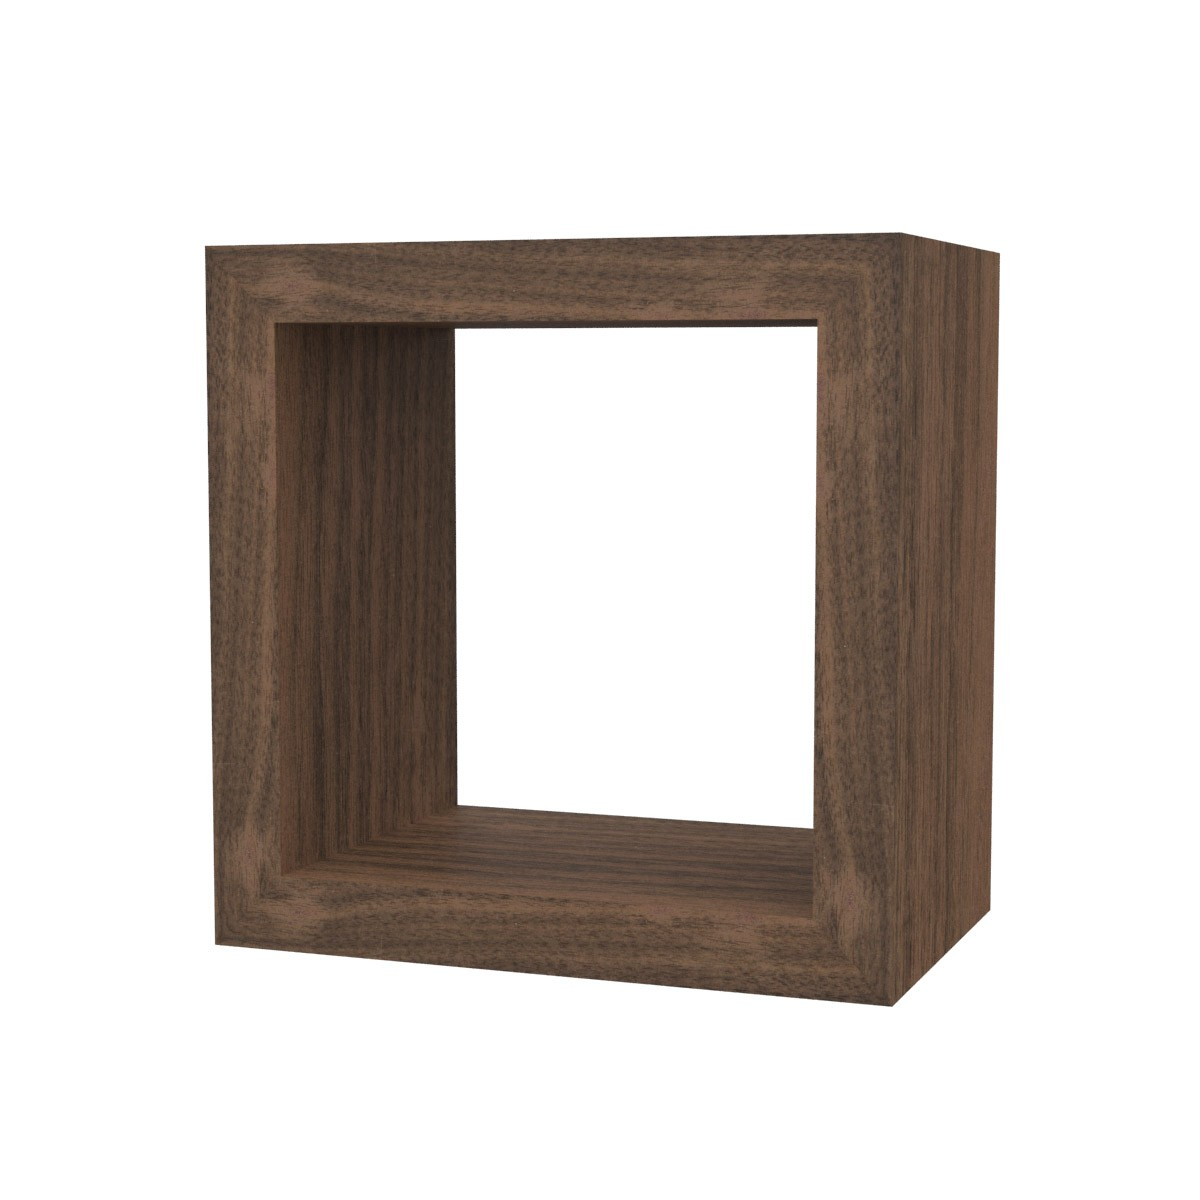 Cubi in legno spessore 4 cm in diverse misure e colori 100 for Cubi in legno per arredare